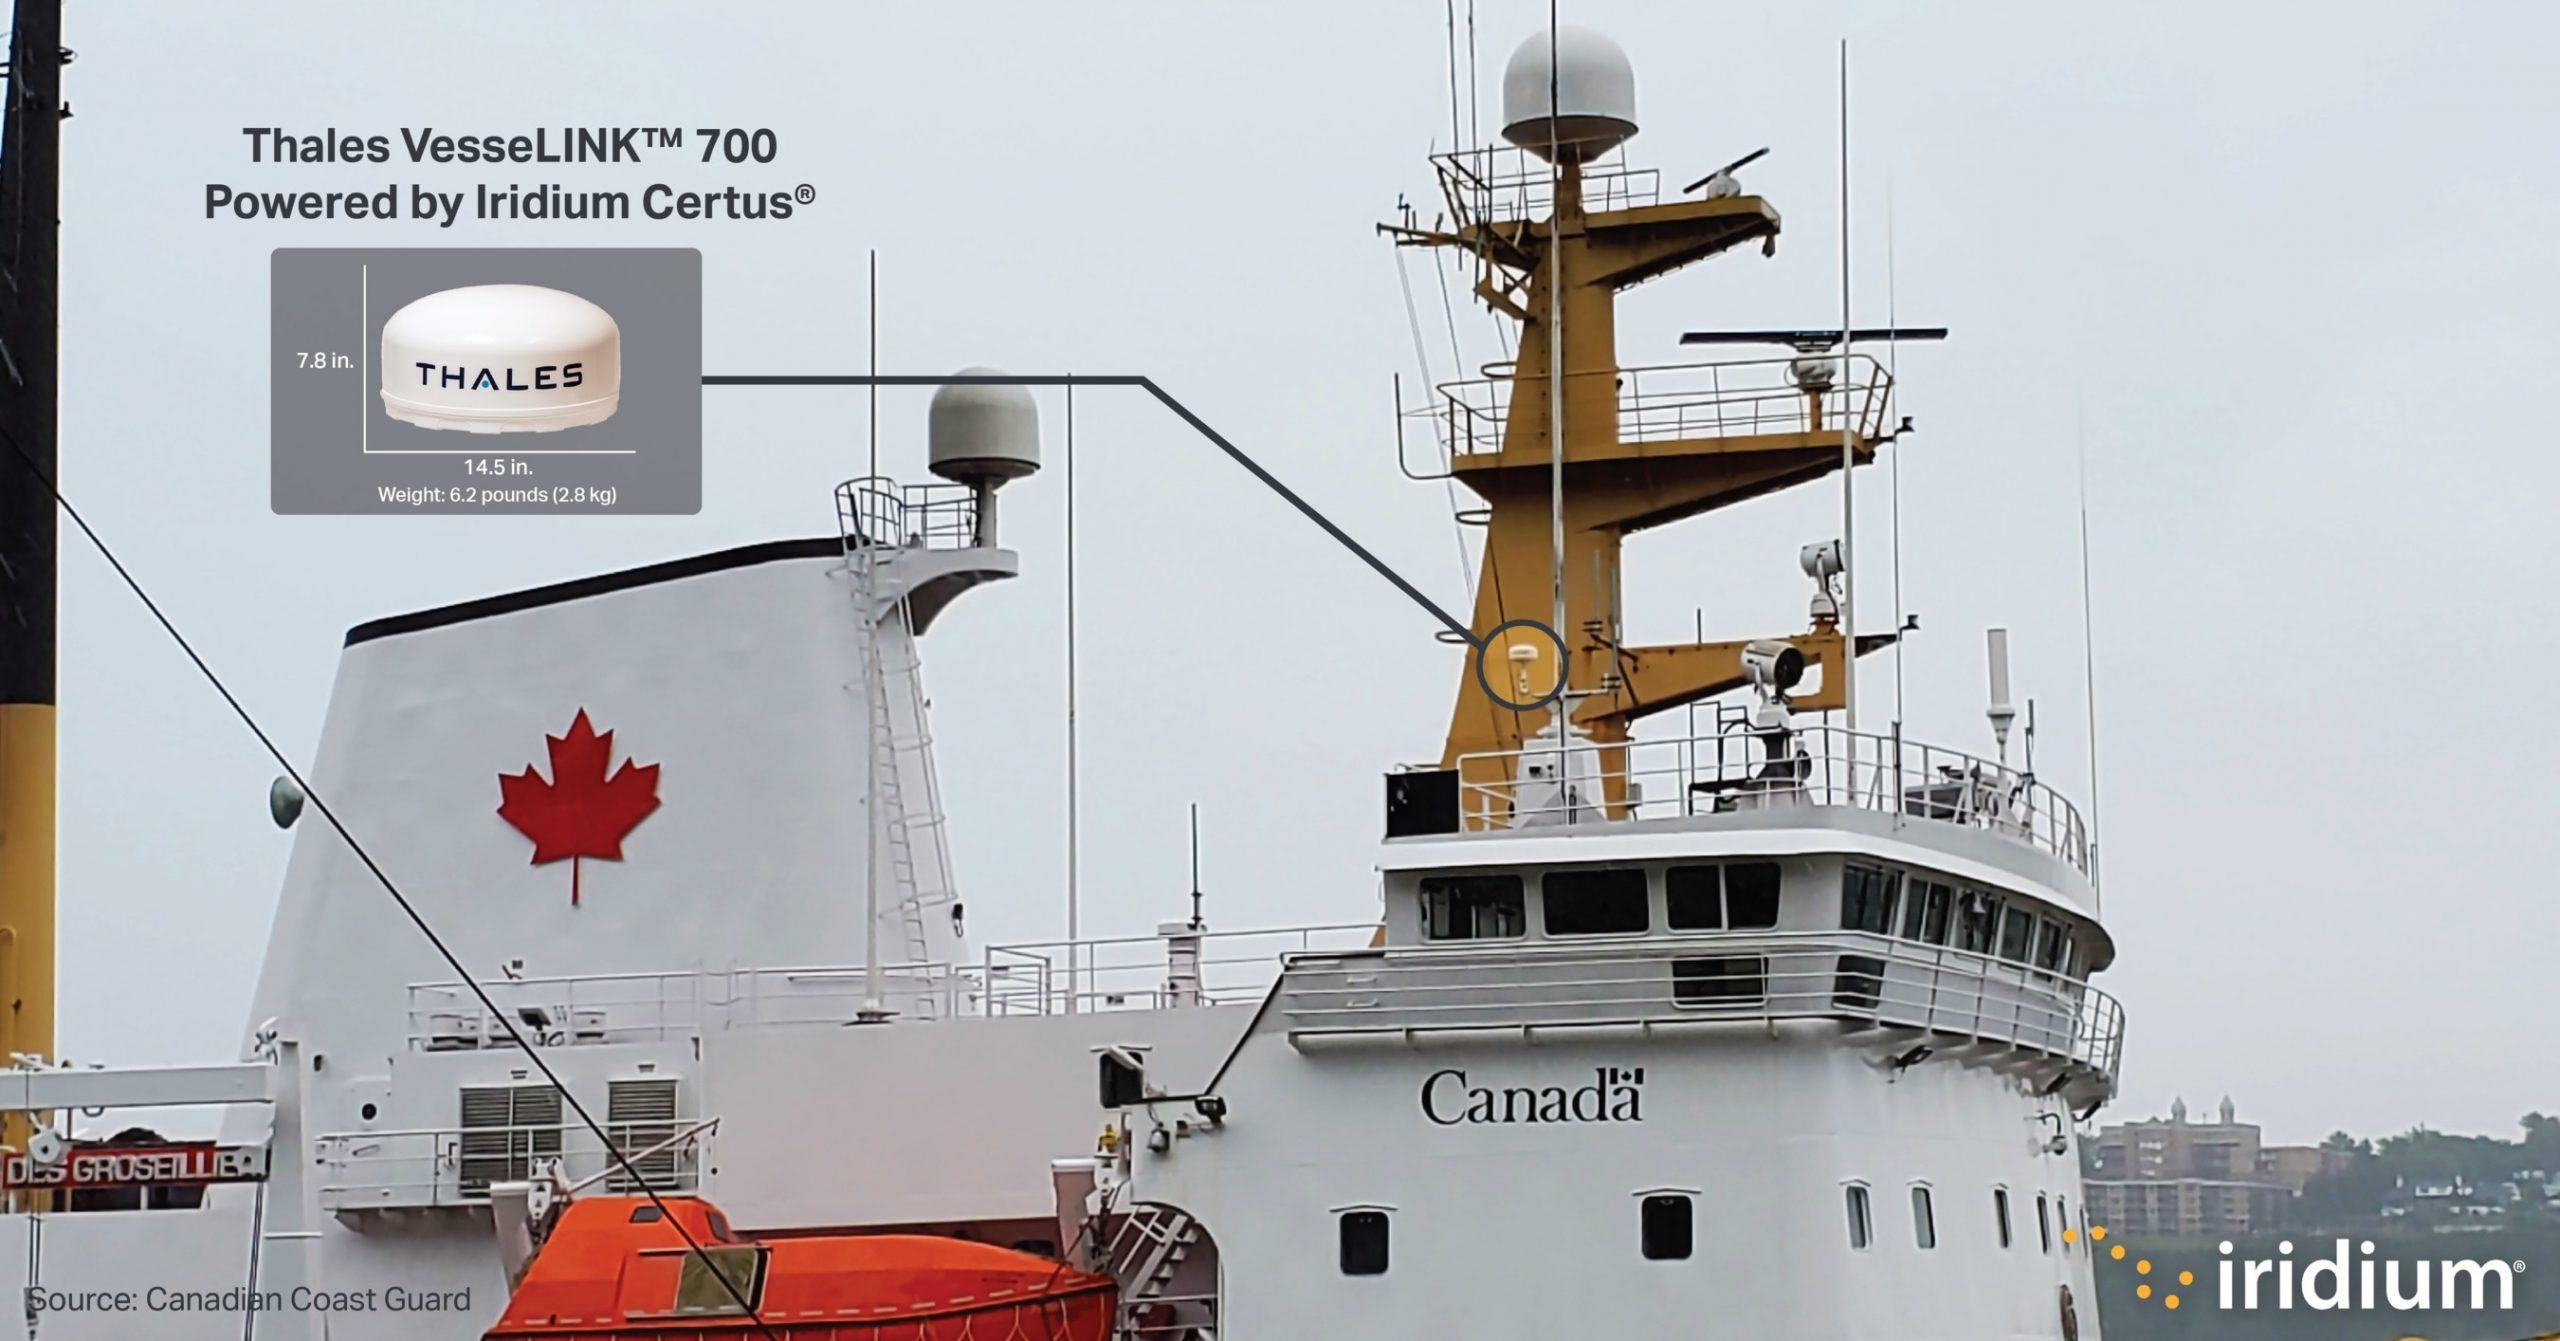 Iridium Communications Inc Announces Partnership with Canadian Coast Guard